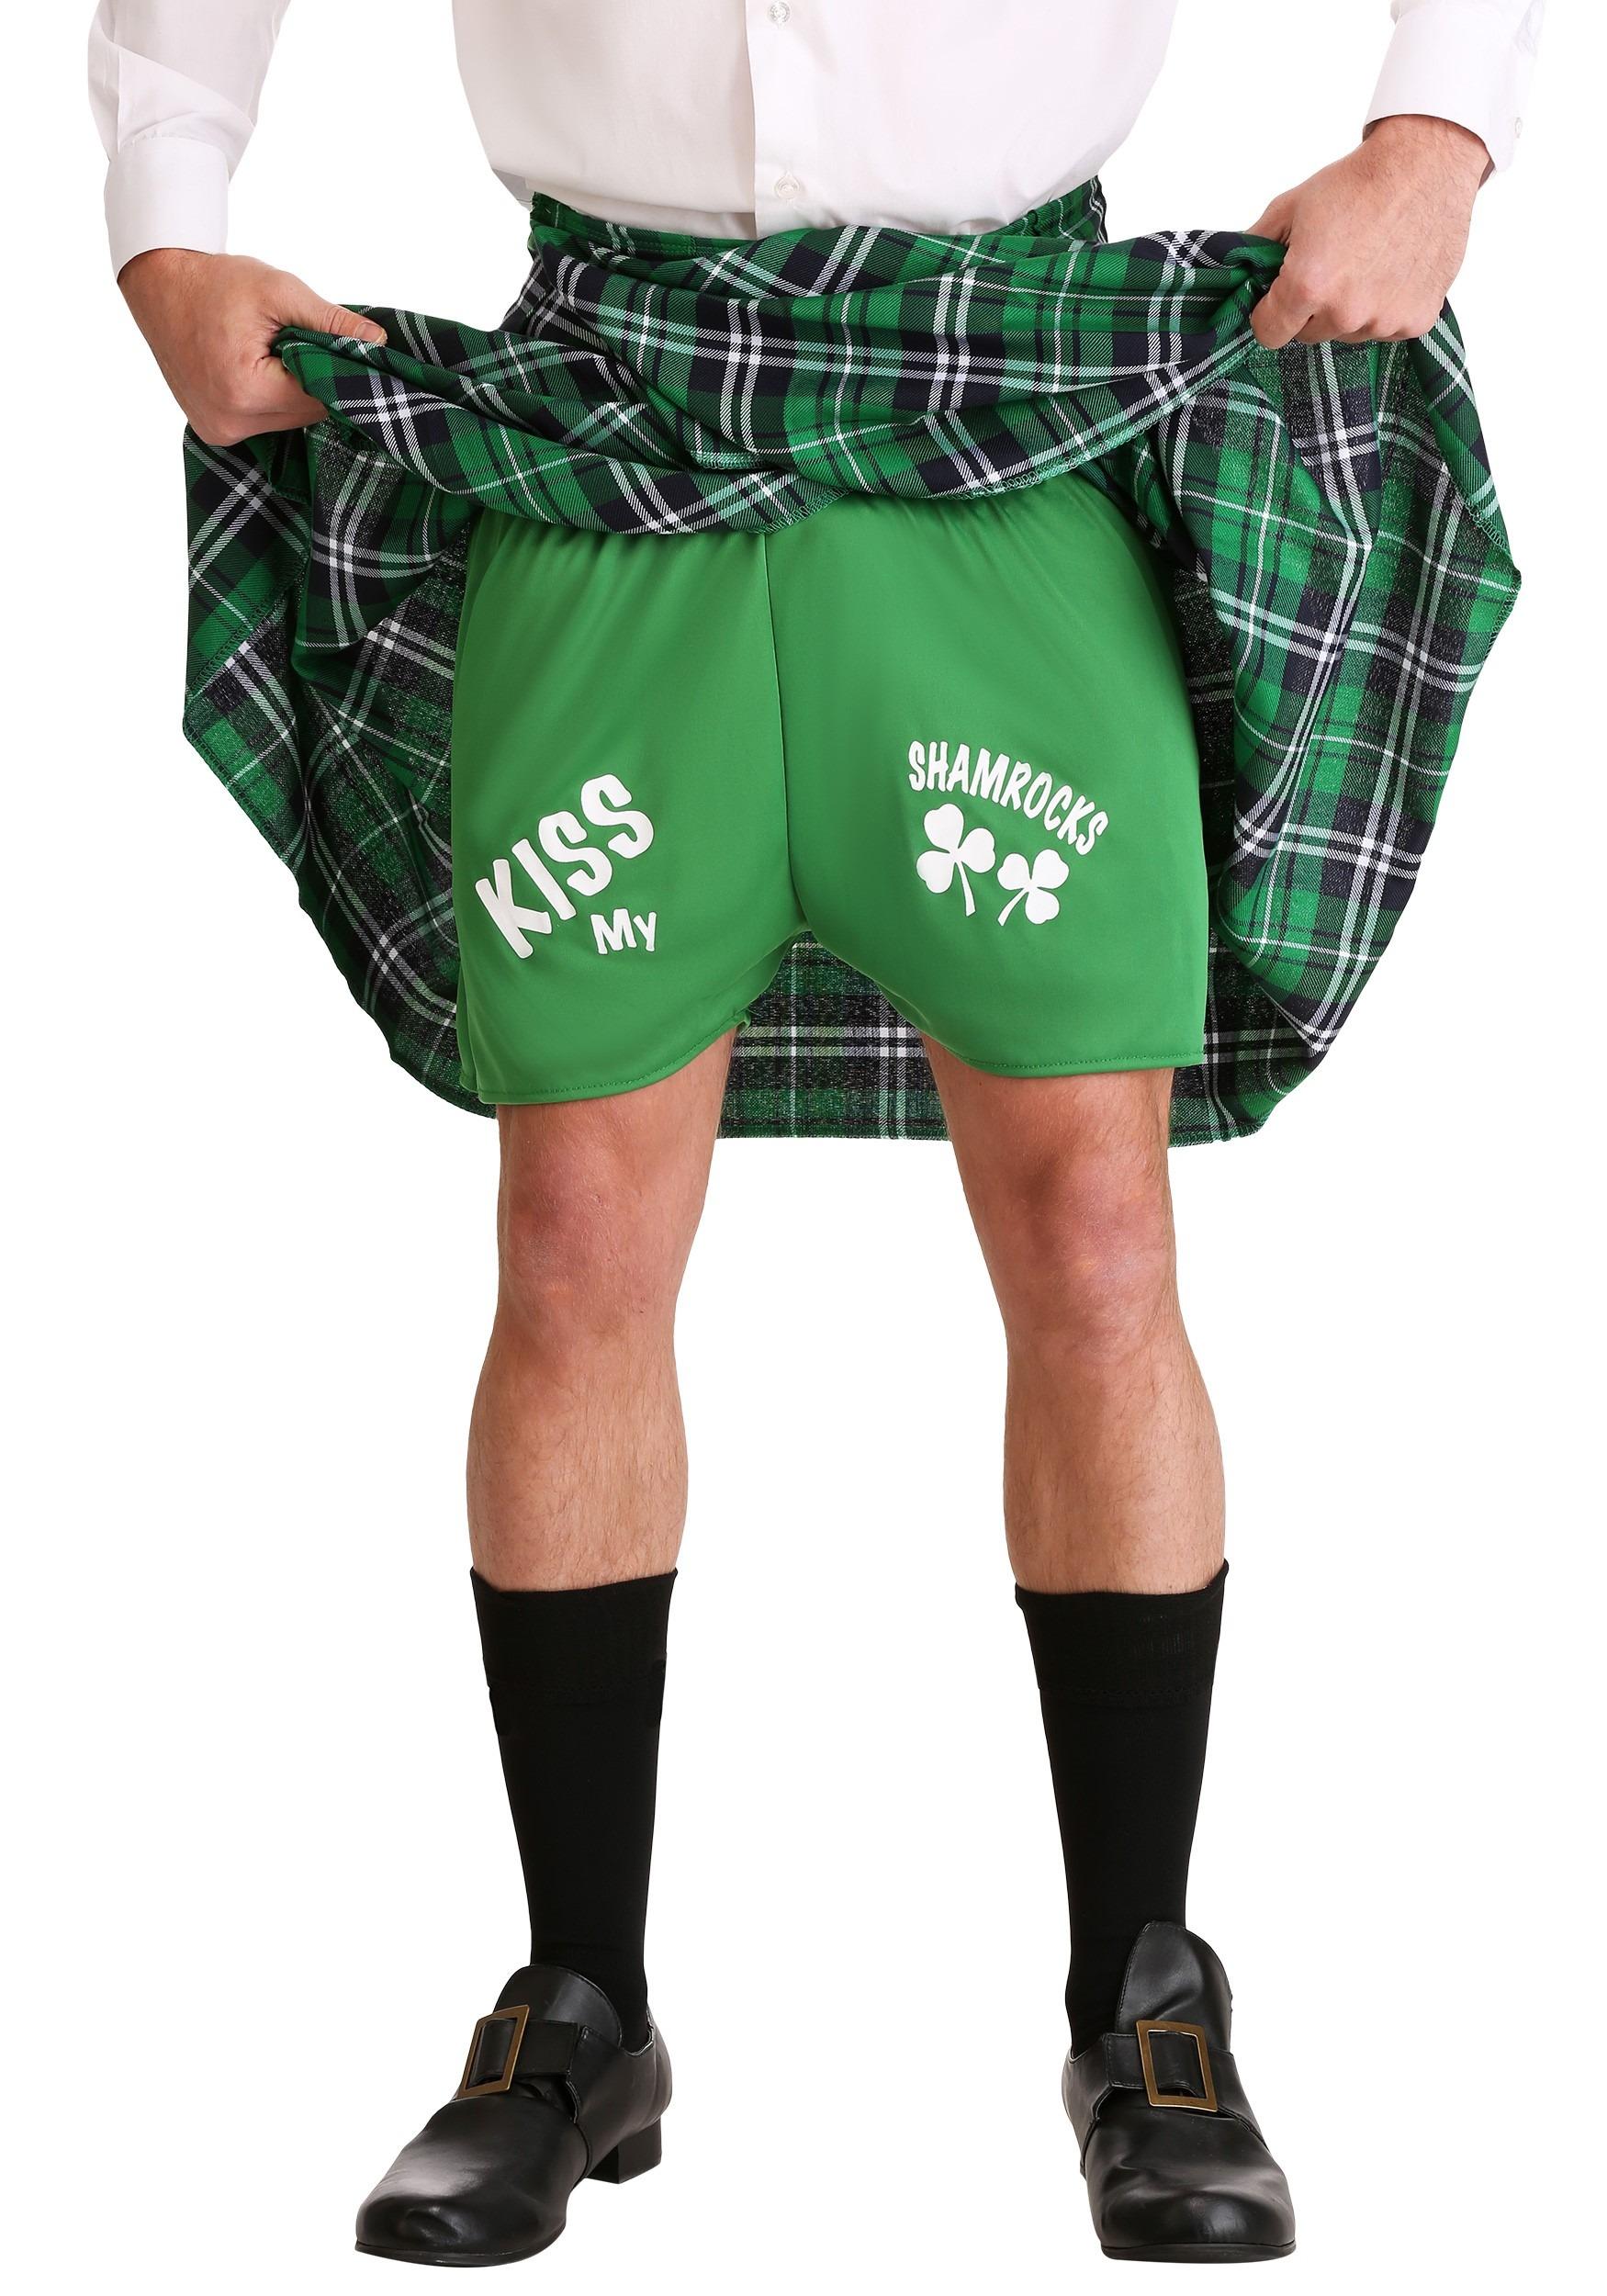 Naughty Kilt and Shorts Set